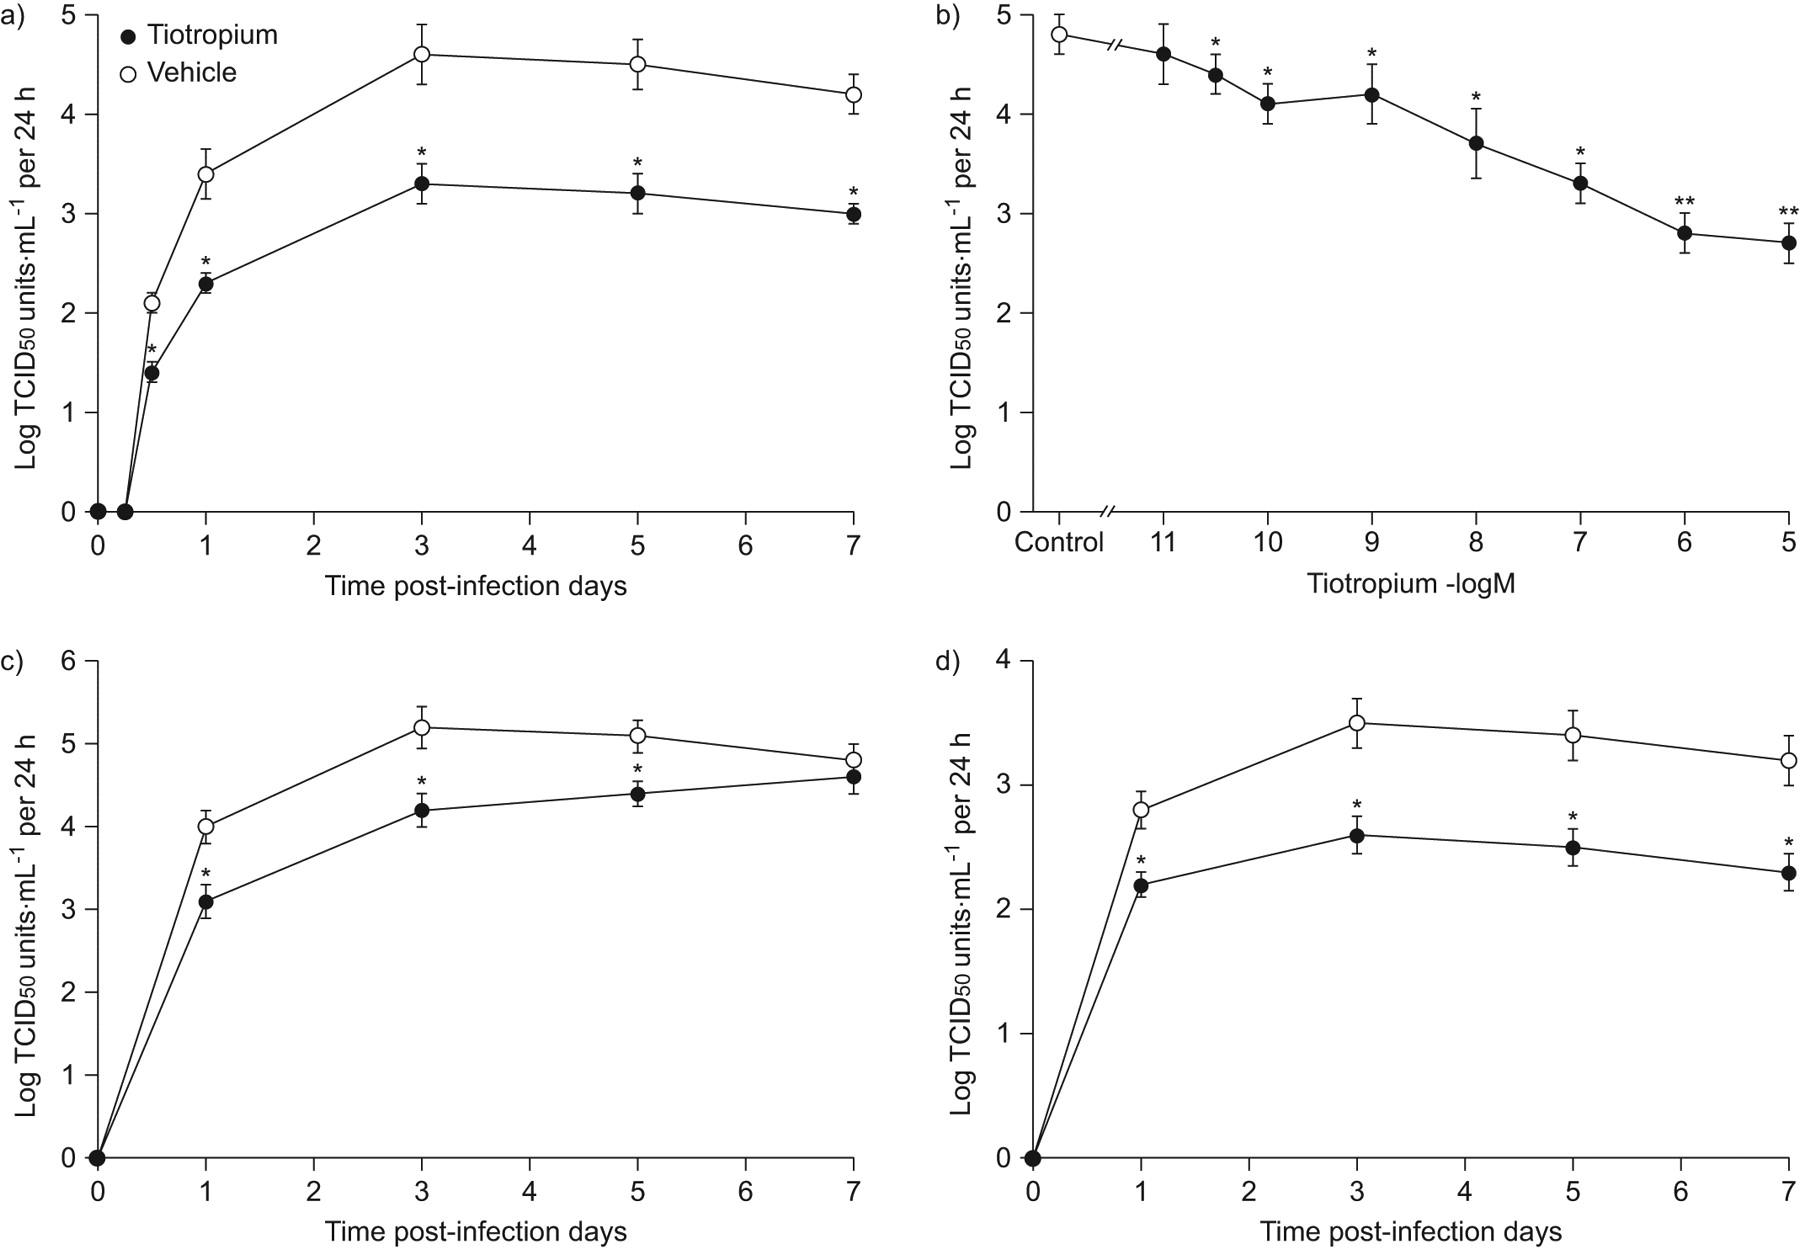 Inhibitory effects of tiotropium on rhinovirus infection in